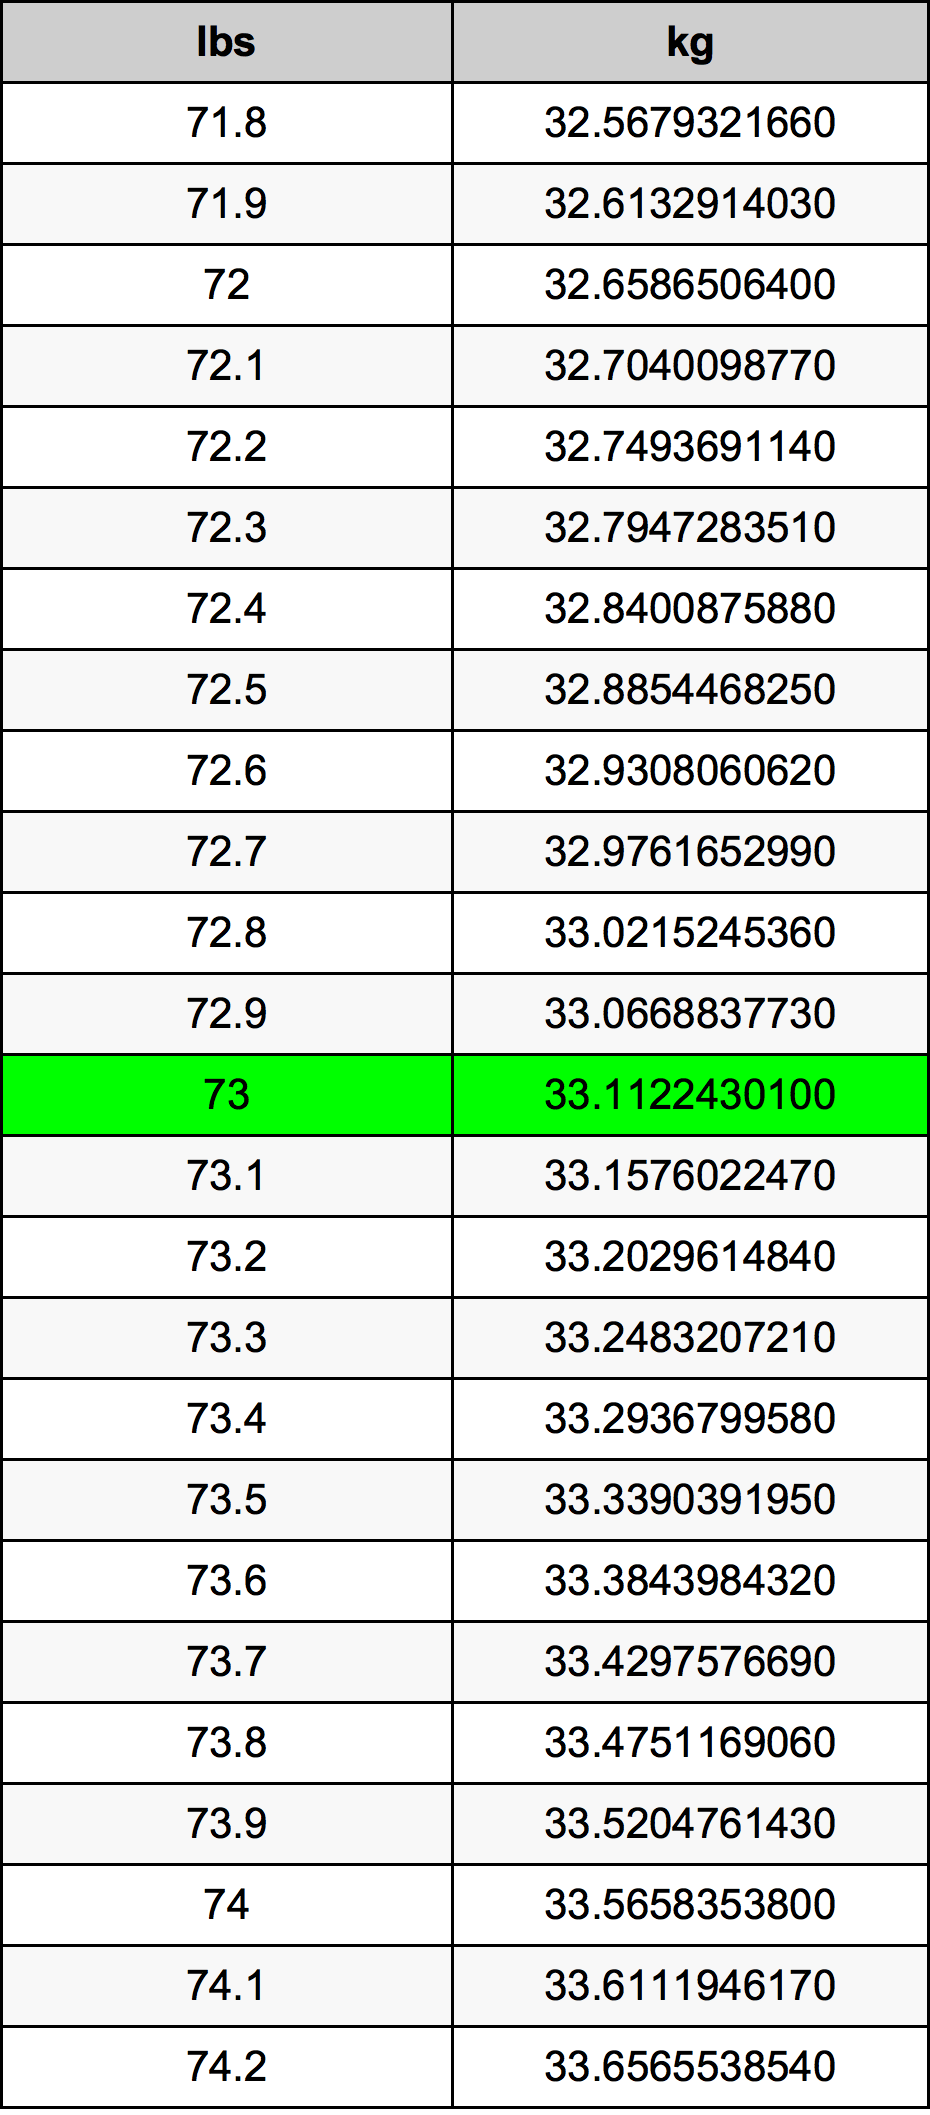 73 Libra konverteringstabellen